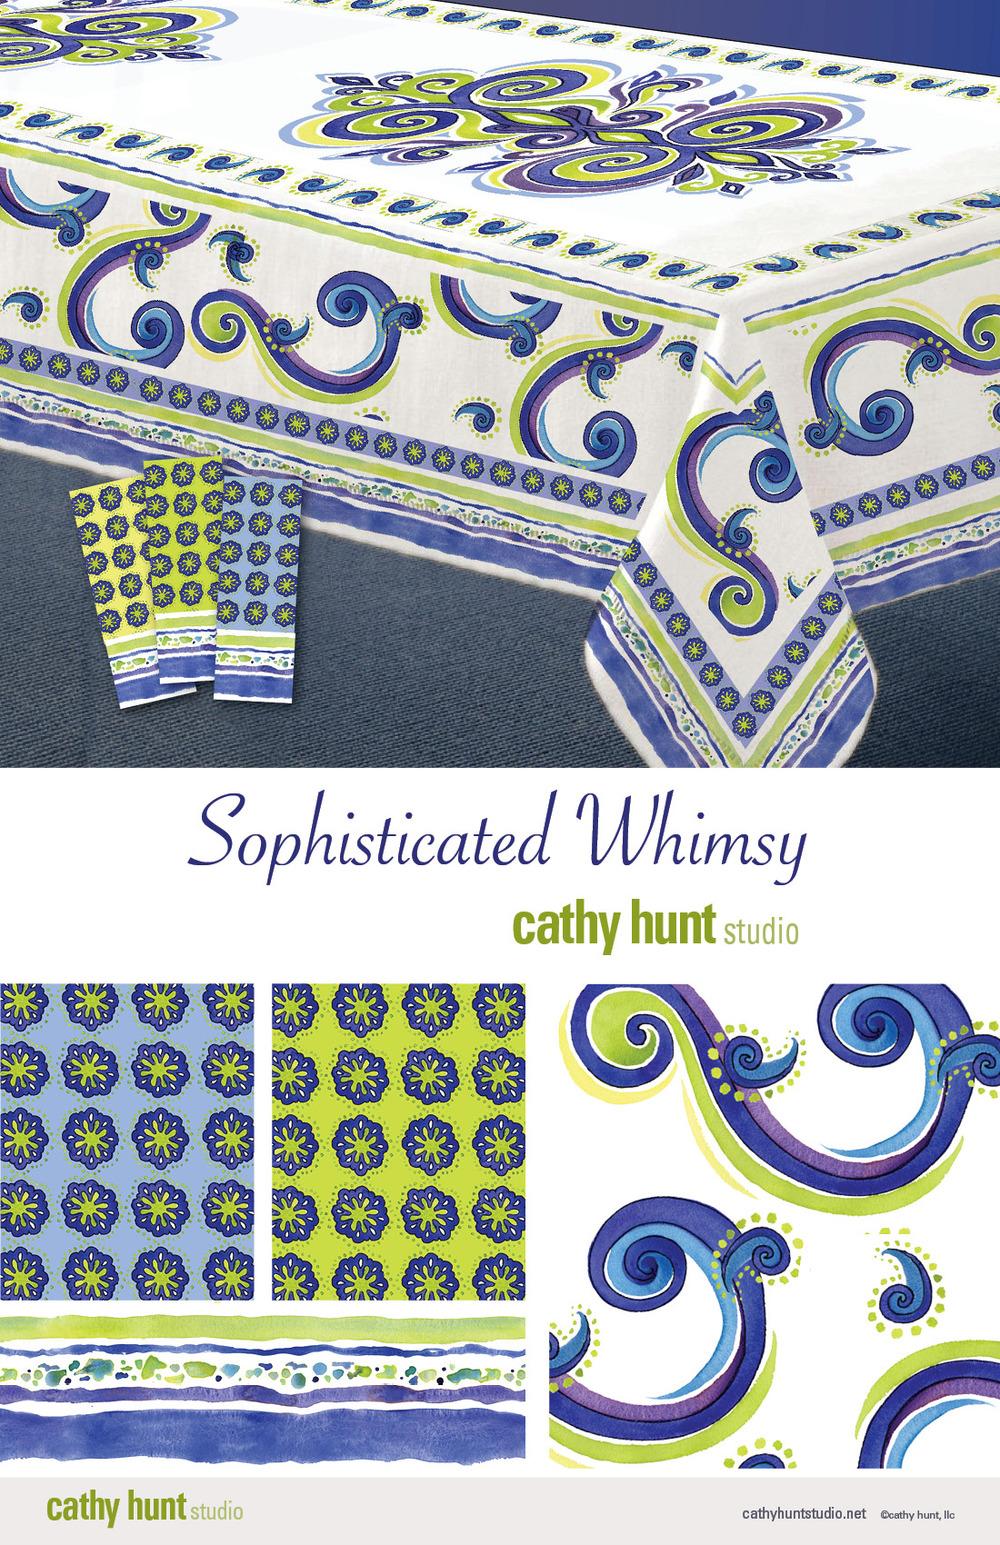 SW001_Sophisticated-Whimsy_cathyhunt3.jpg